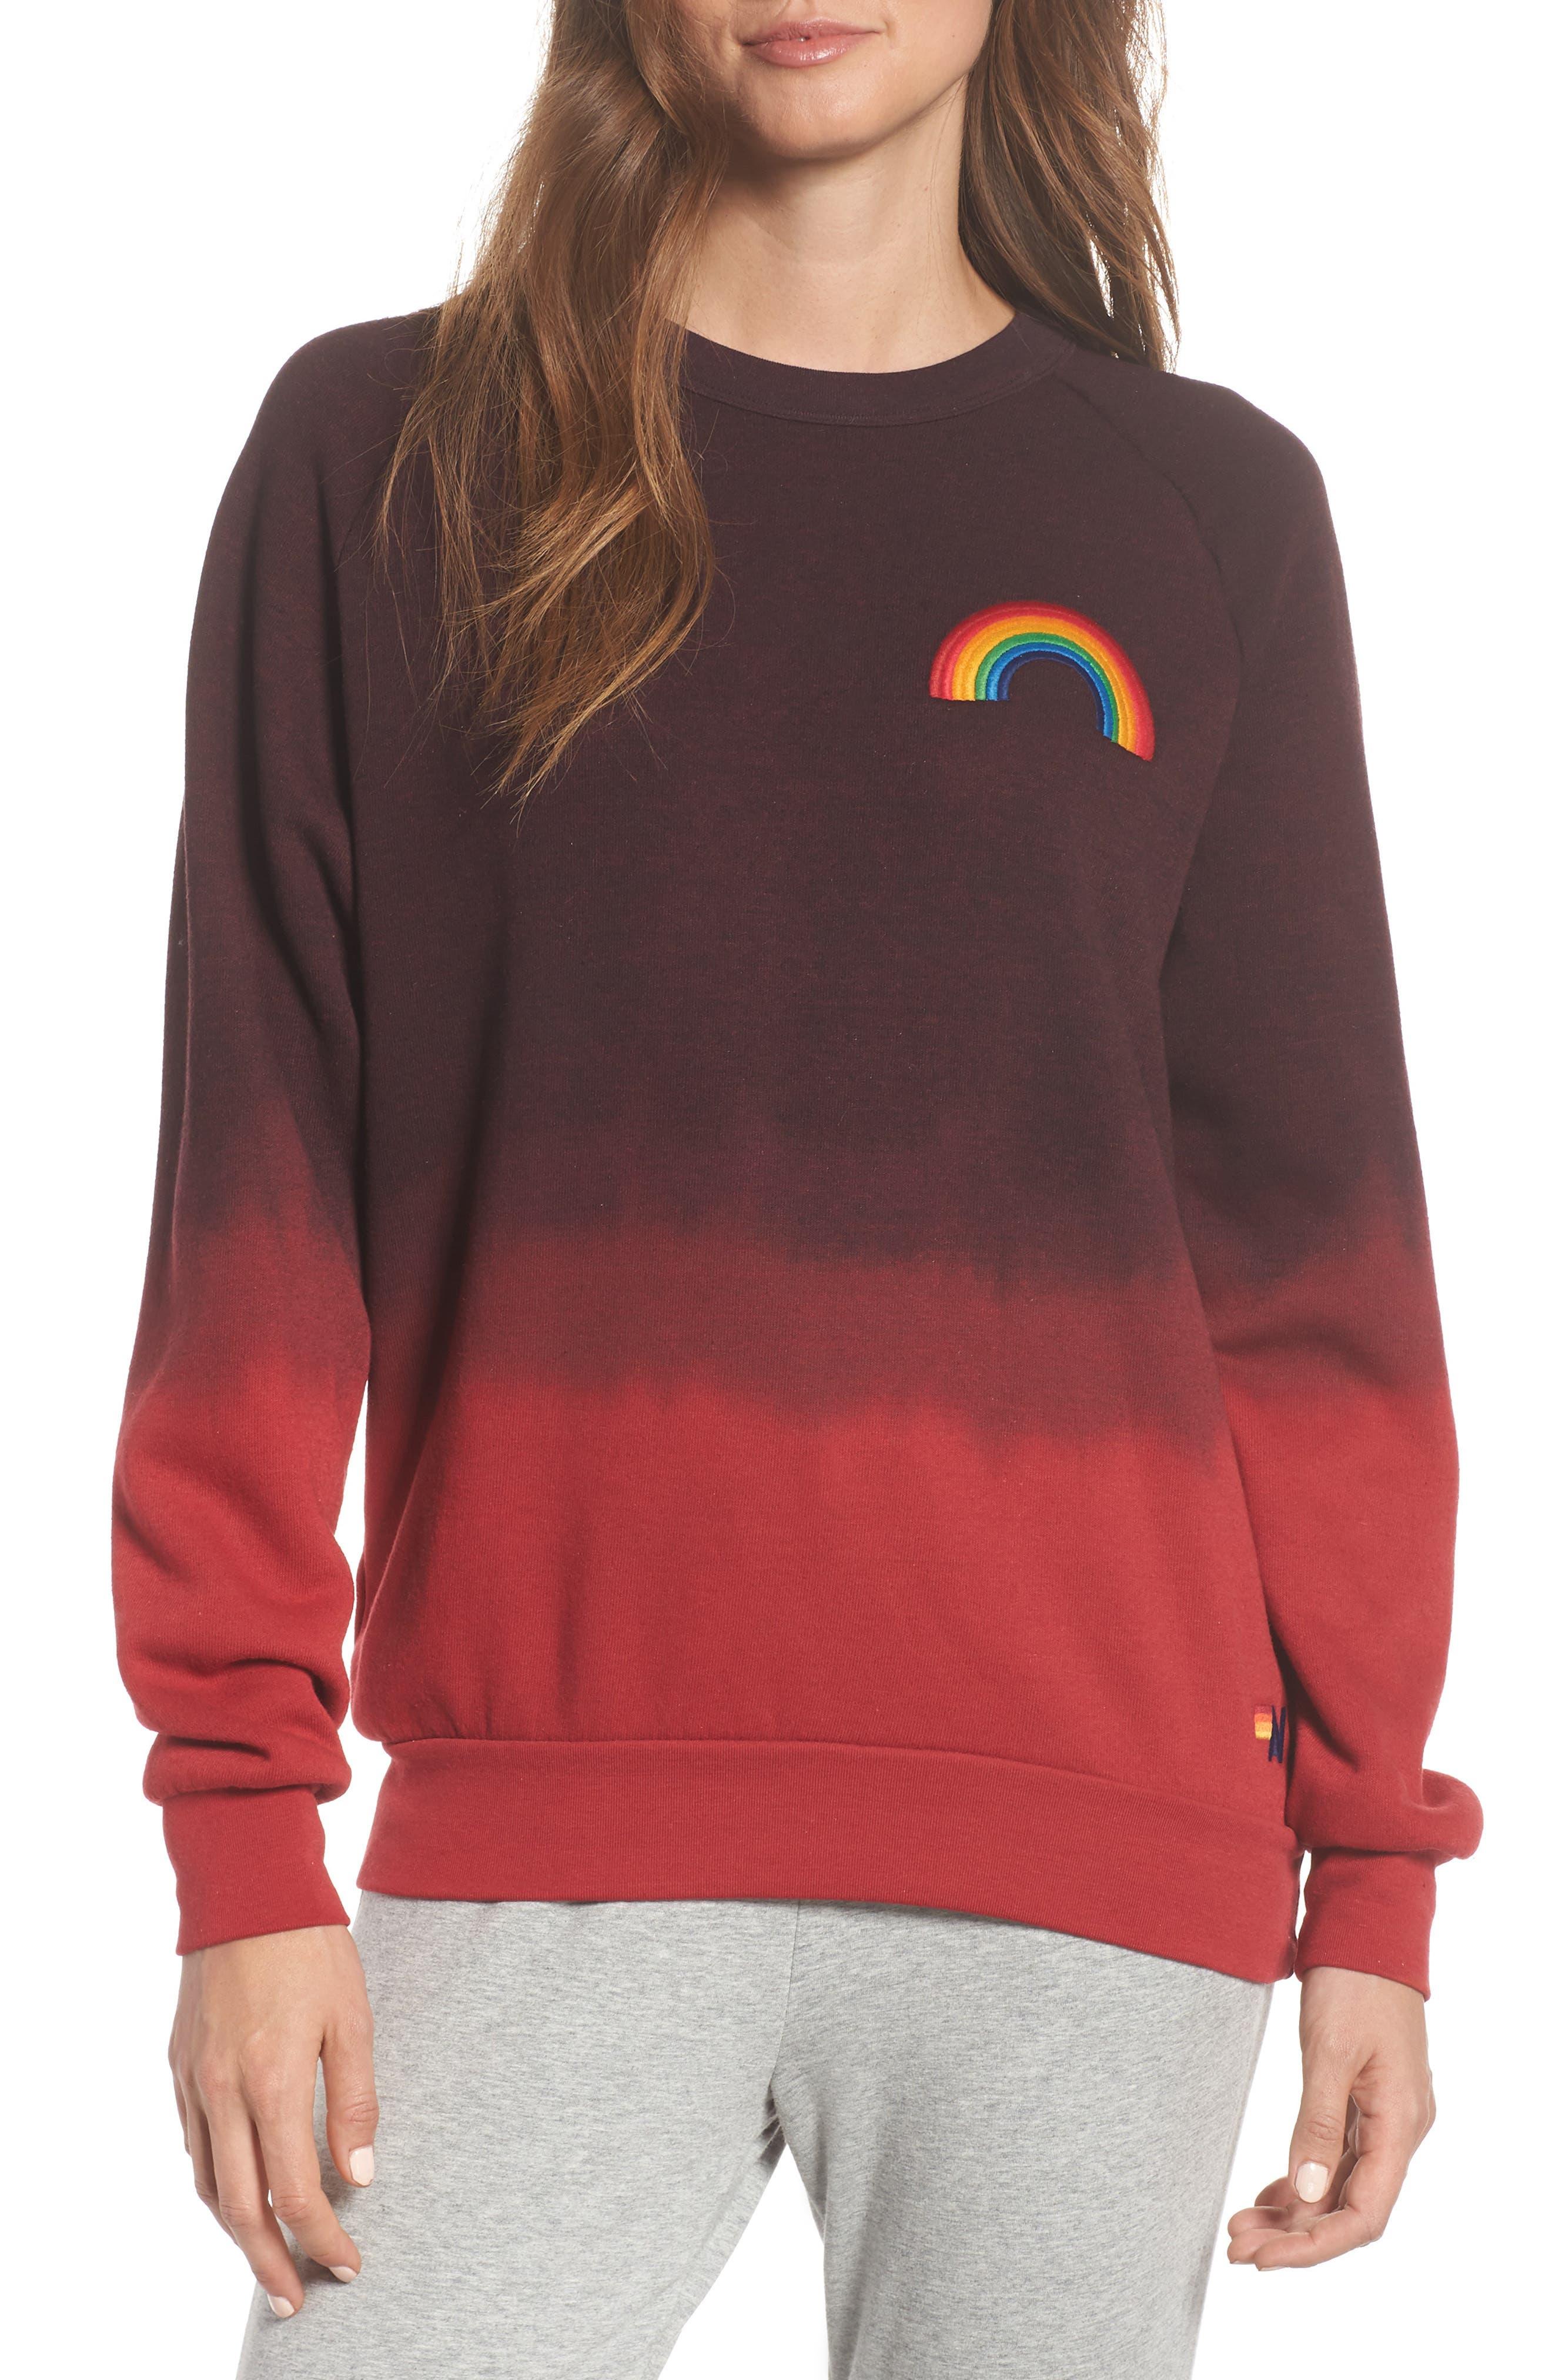 AVIATOR NATION Rainbow Fade Crewneck Sweatshirt in Red / Charcoal